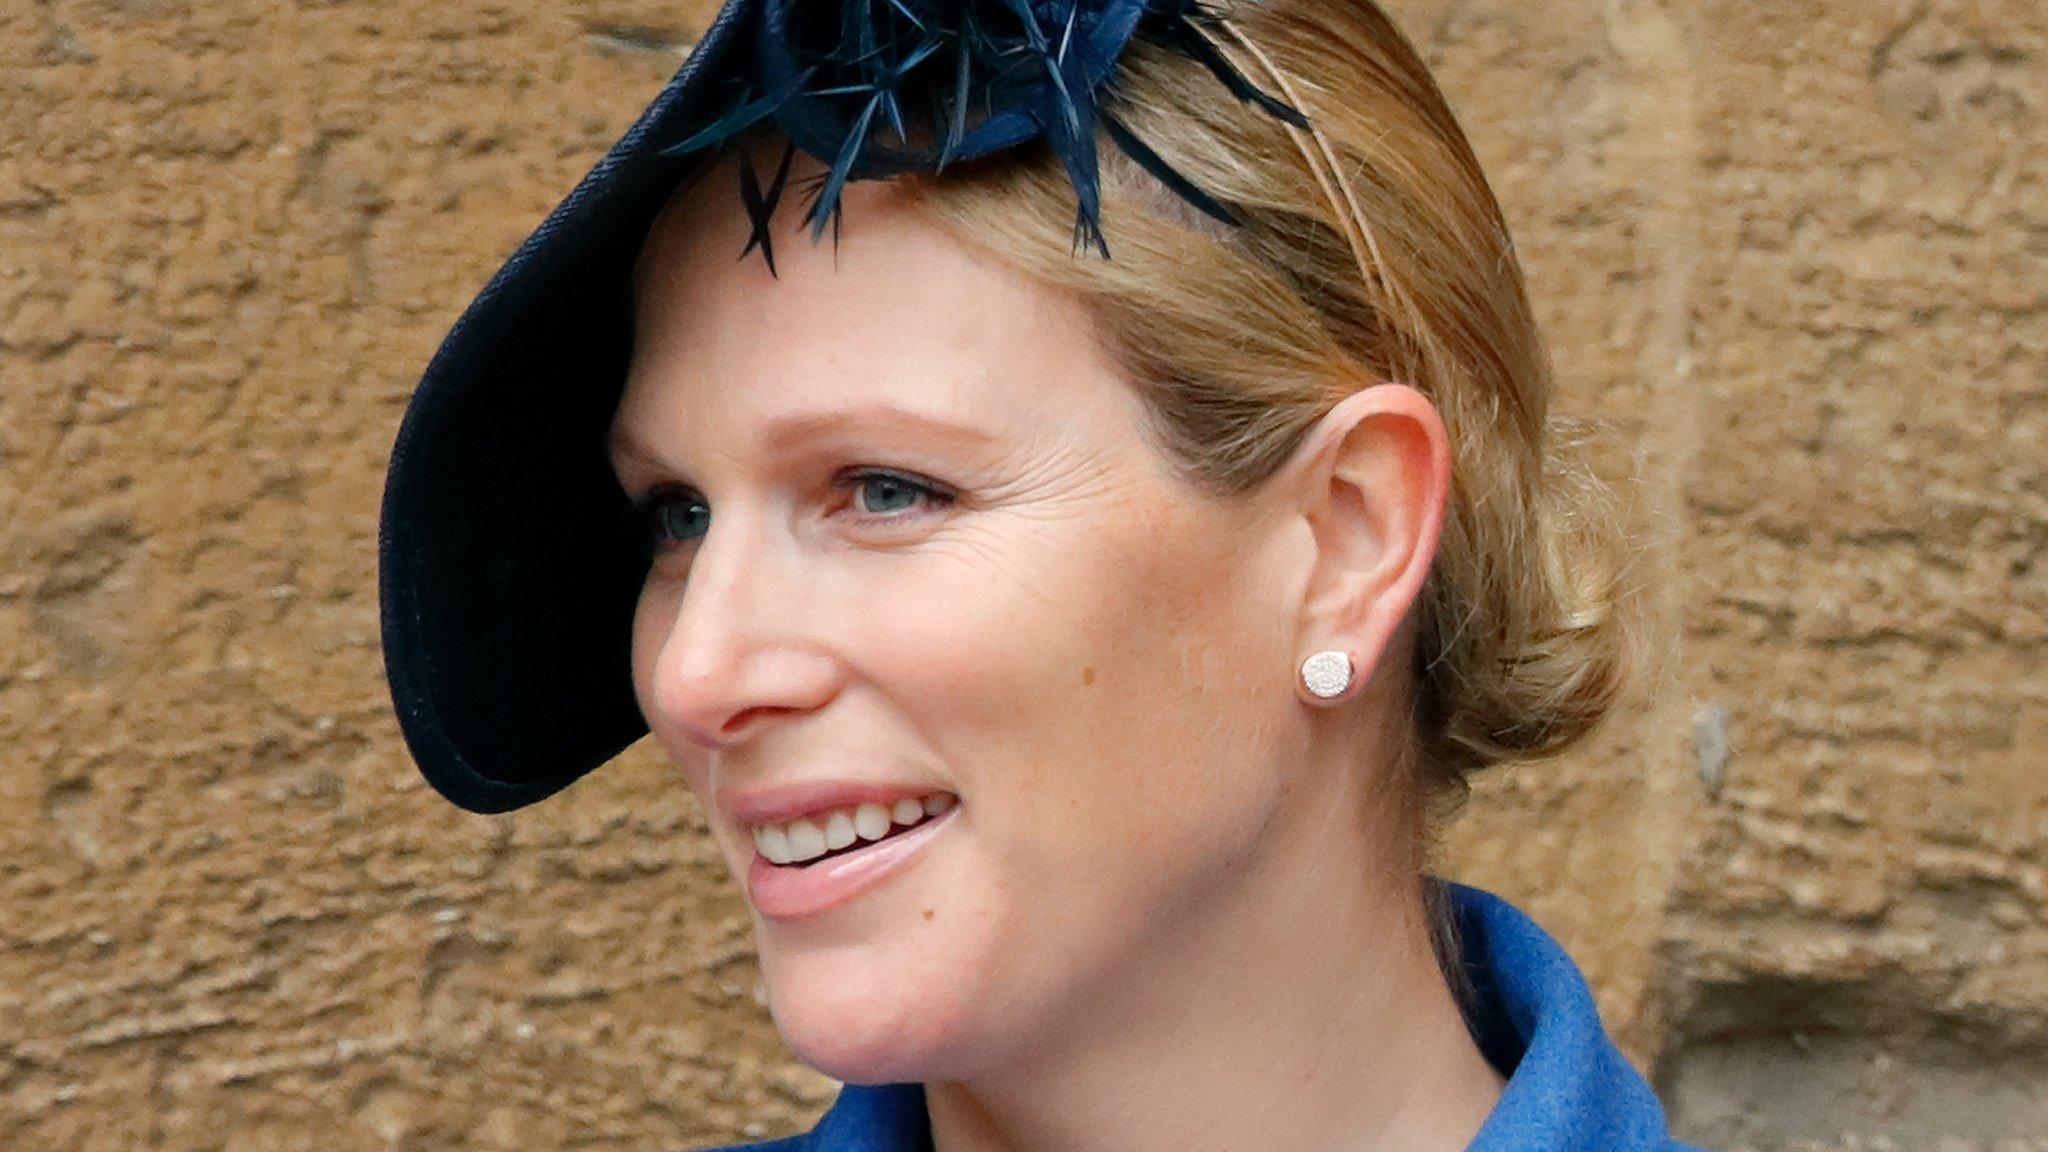 Zara Tindall: Queen's granddaughter has baby girl